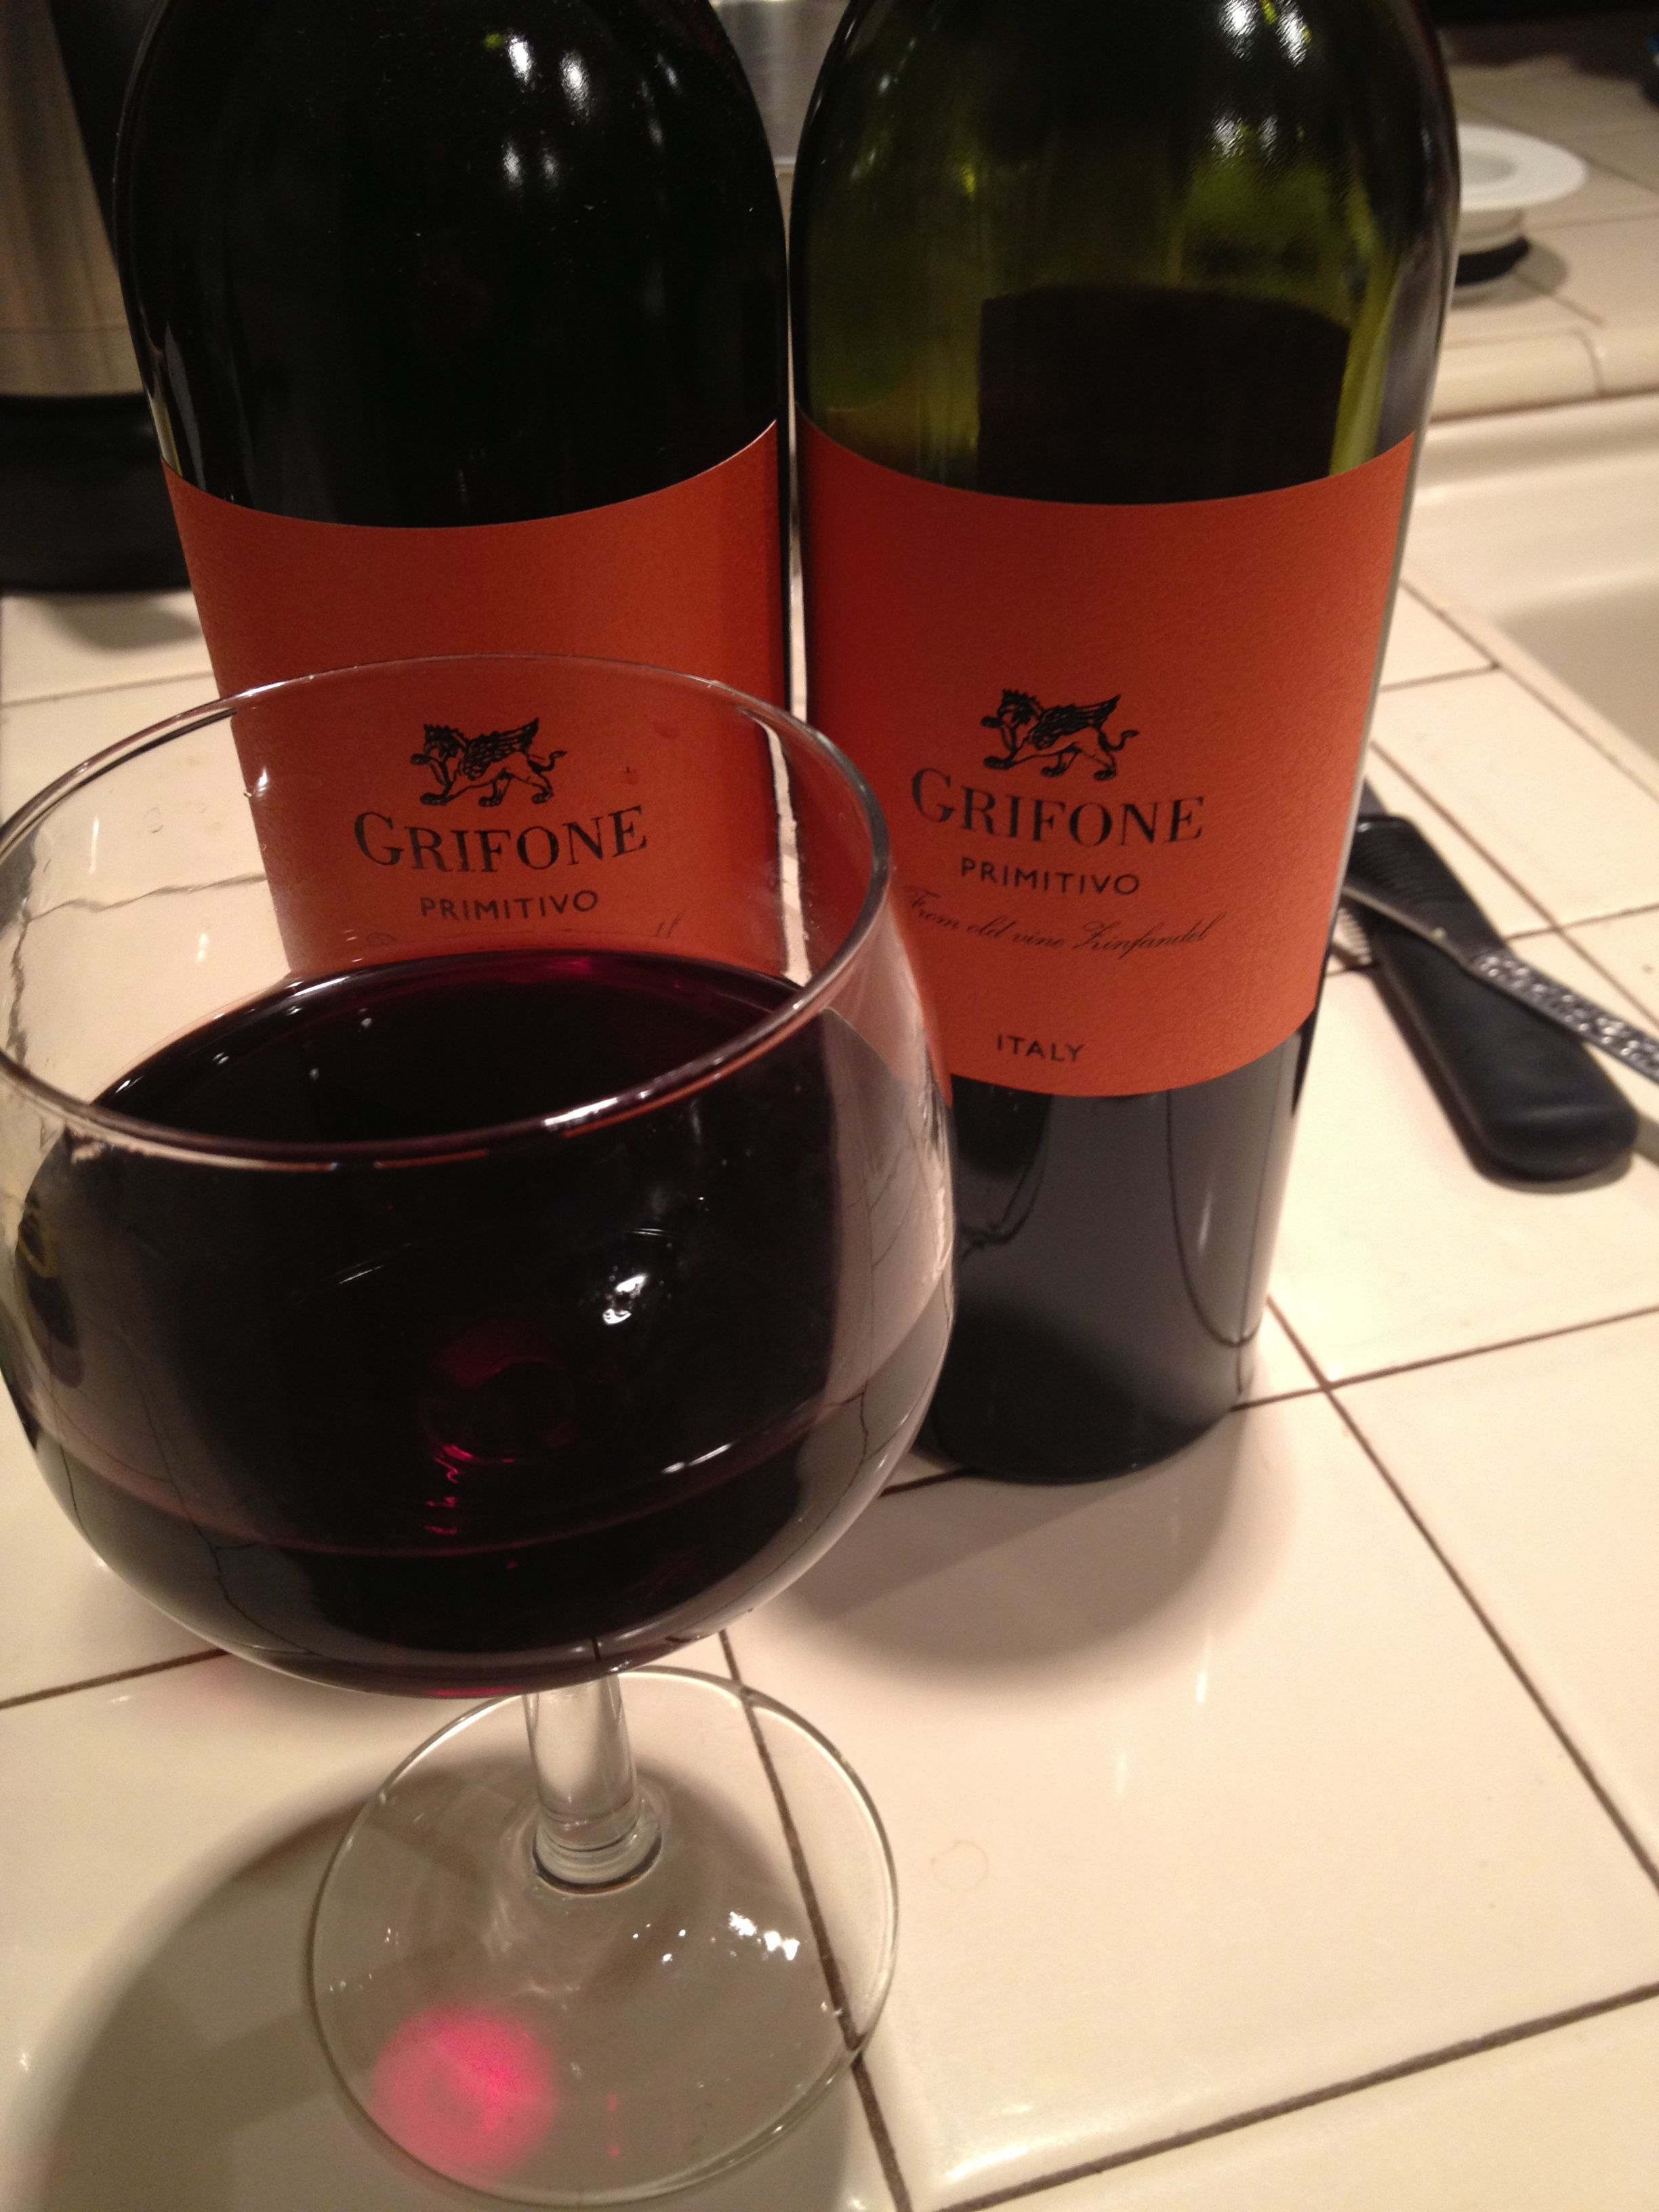 Earthy Spicy Italian Wine Vinhos Tinto